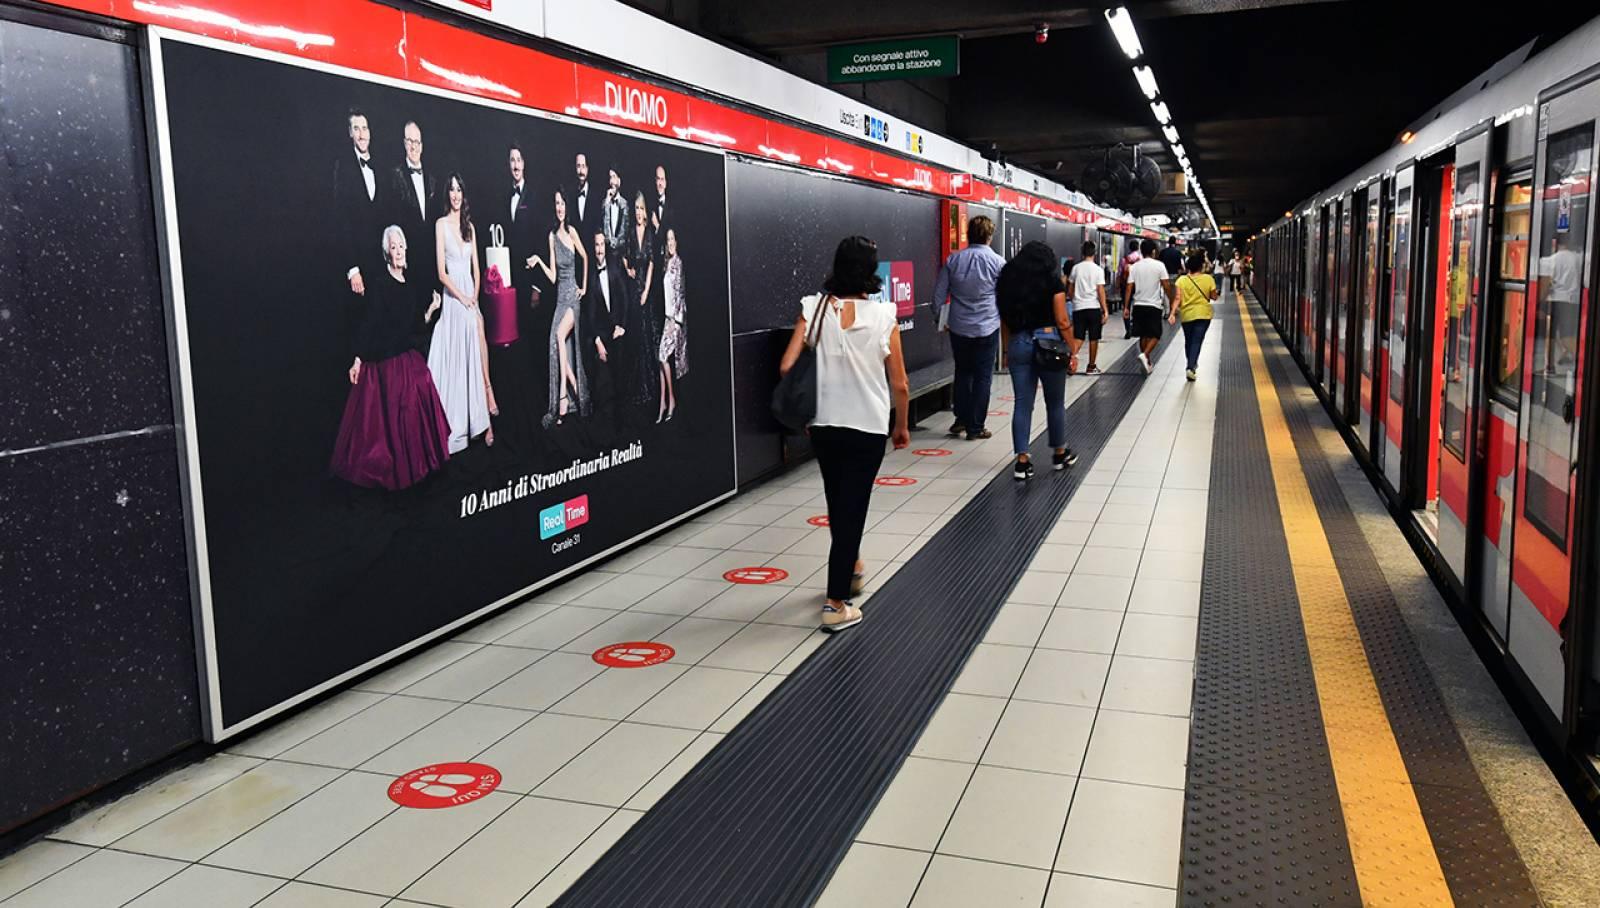 Pubblicità in metropolitana Station Domination IGPDecaux Milano per Discovery Real Time